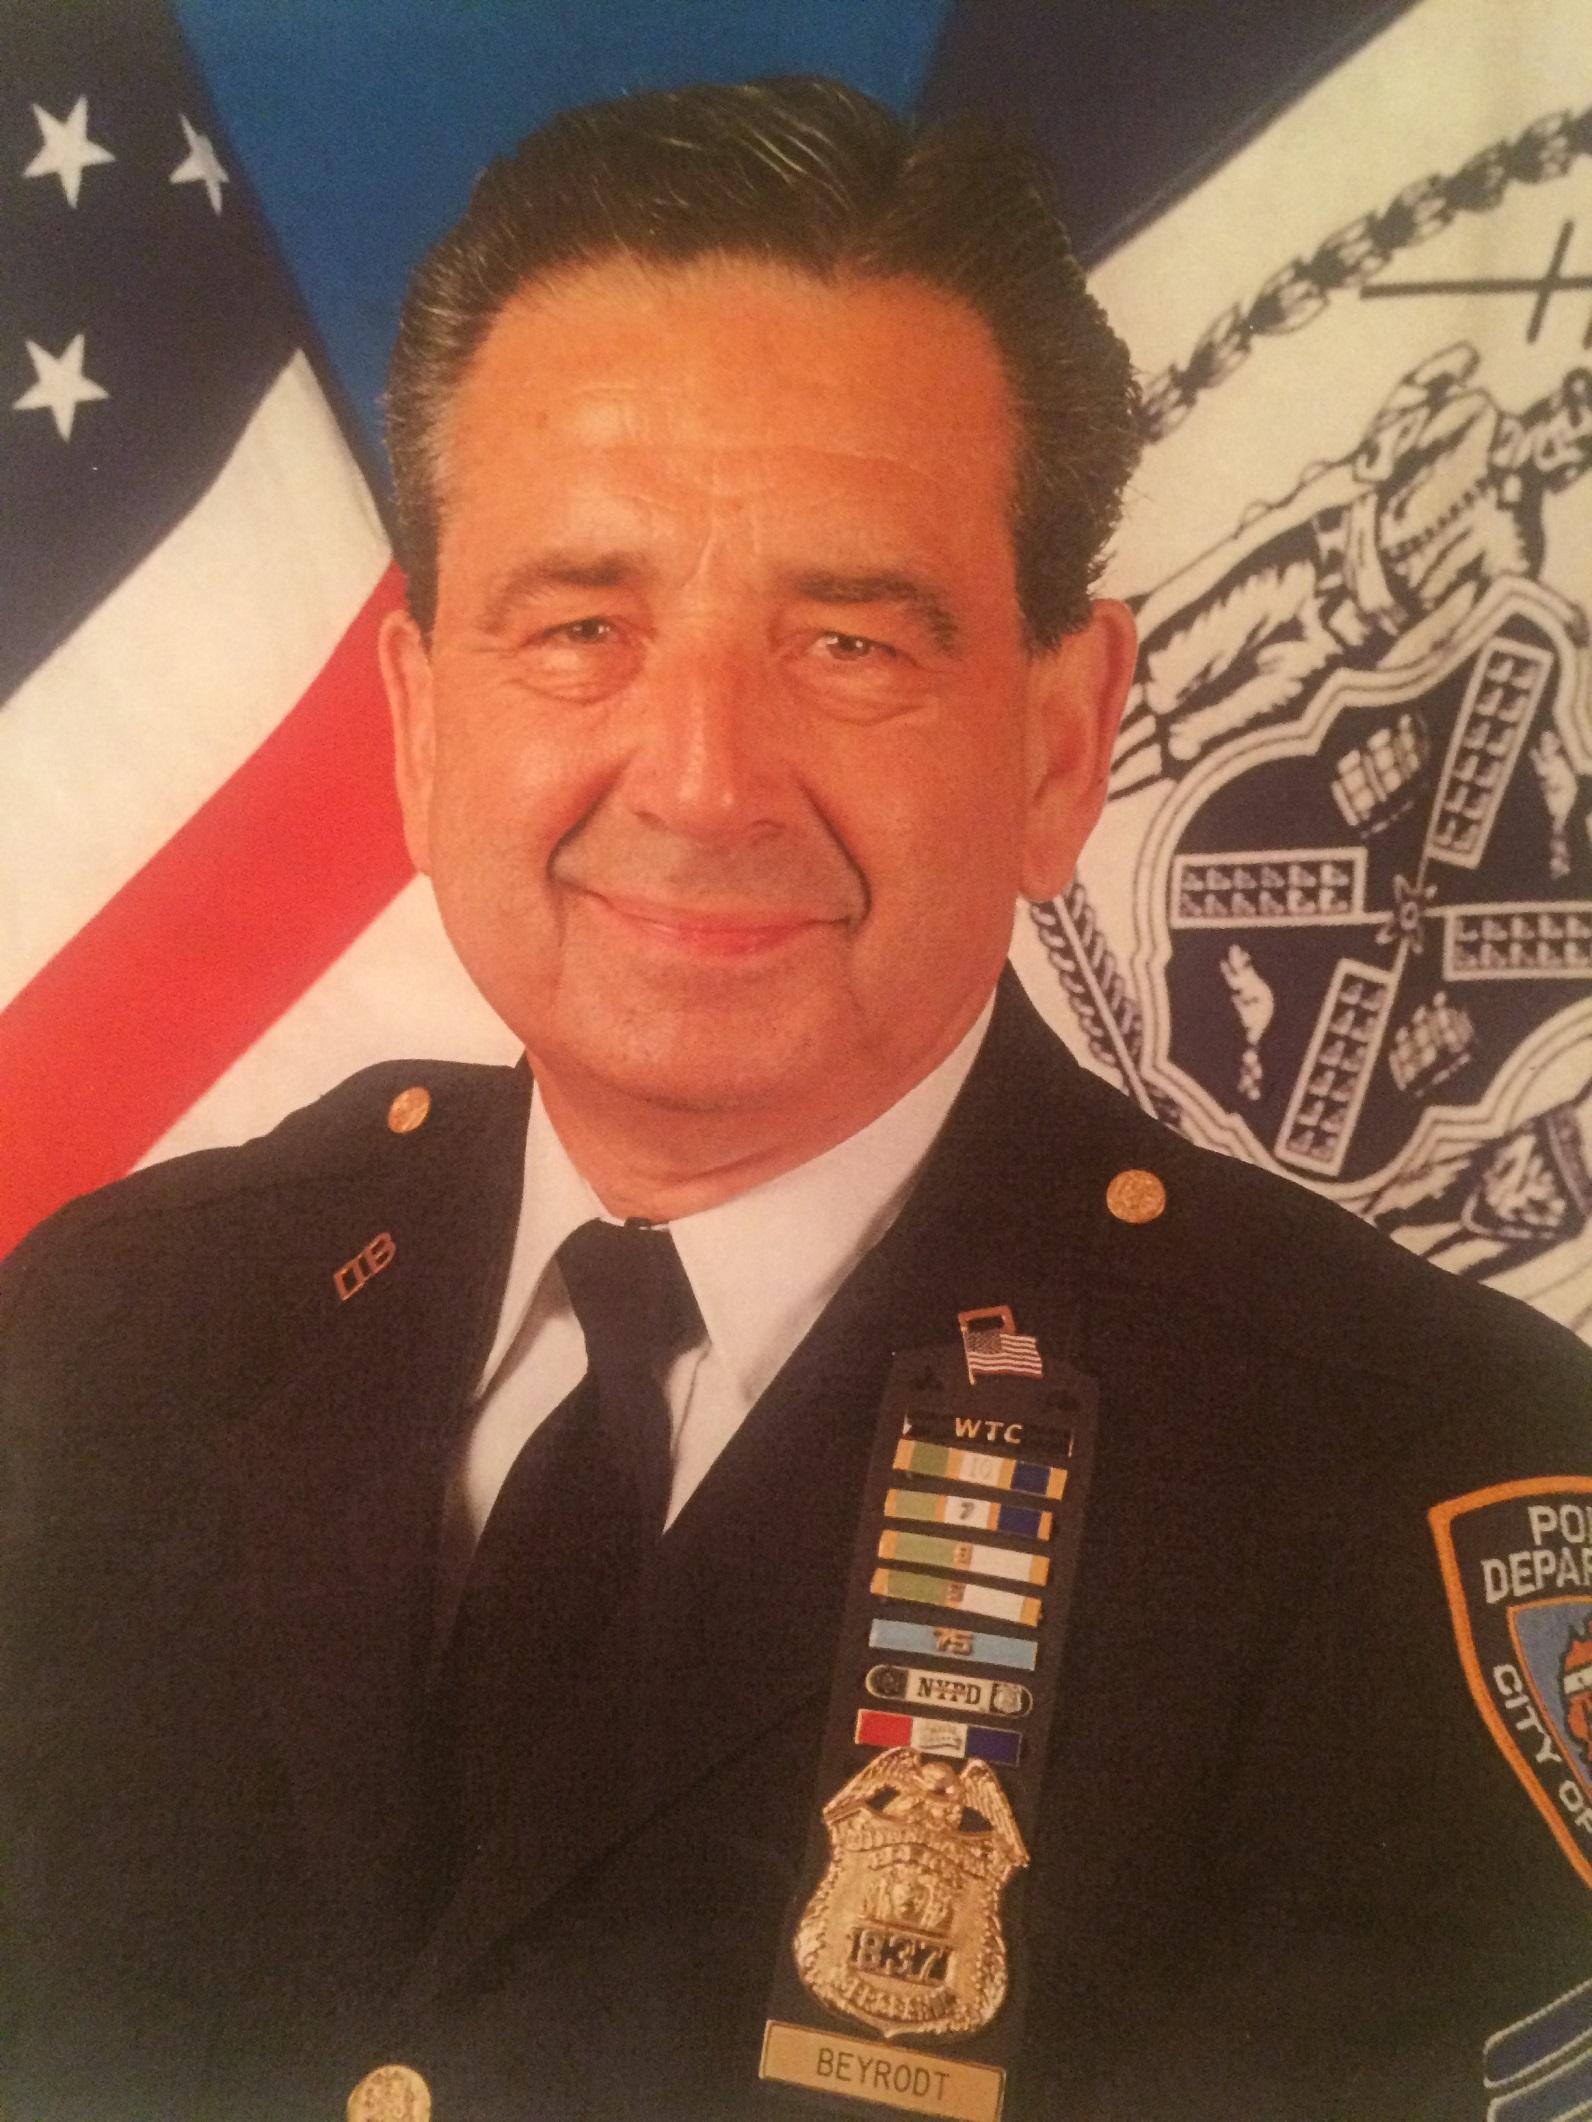 Sergeant Gerard Thomas Beyrodt | New York City Police Department, New York